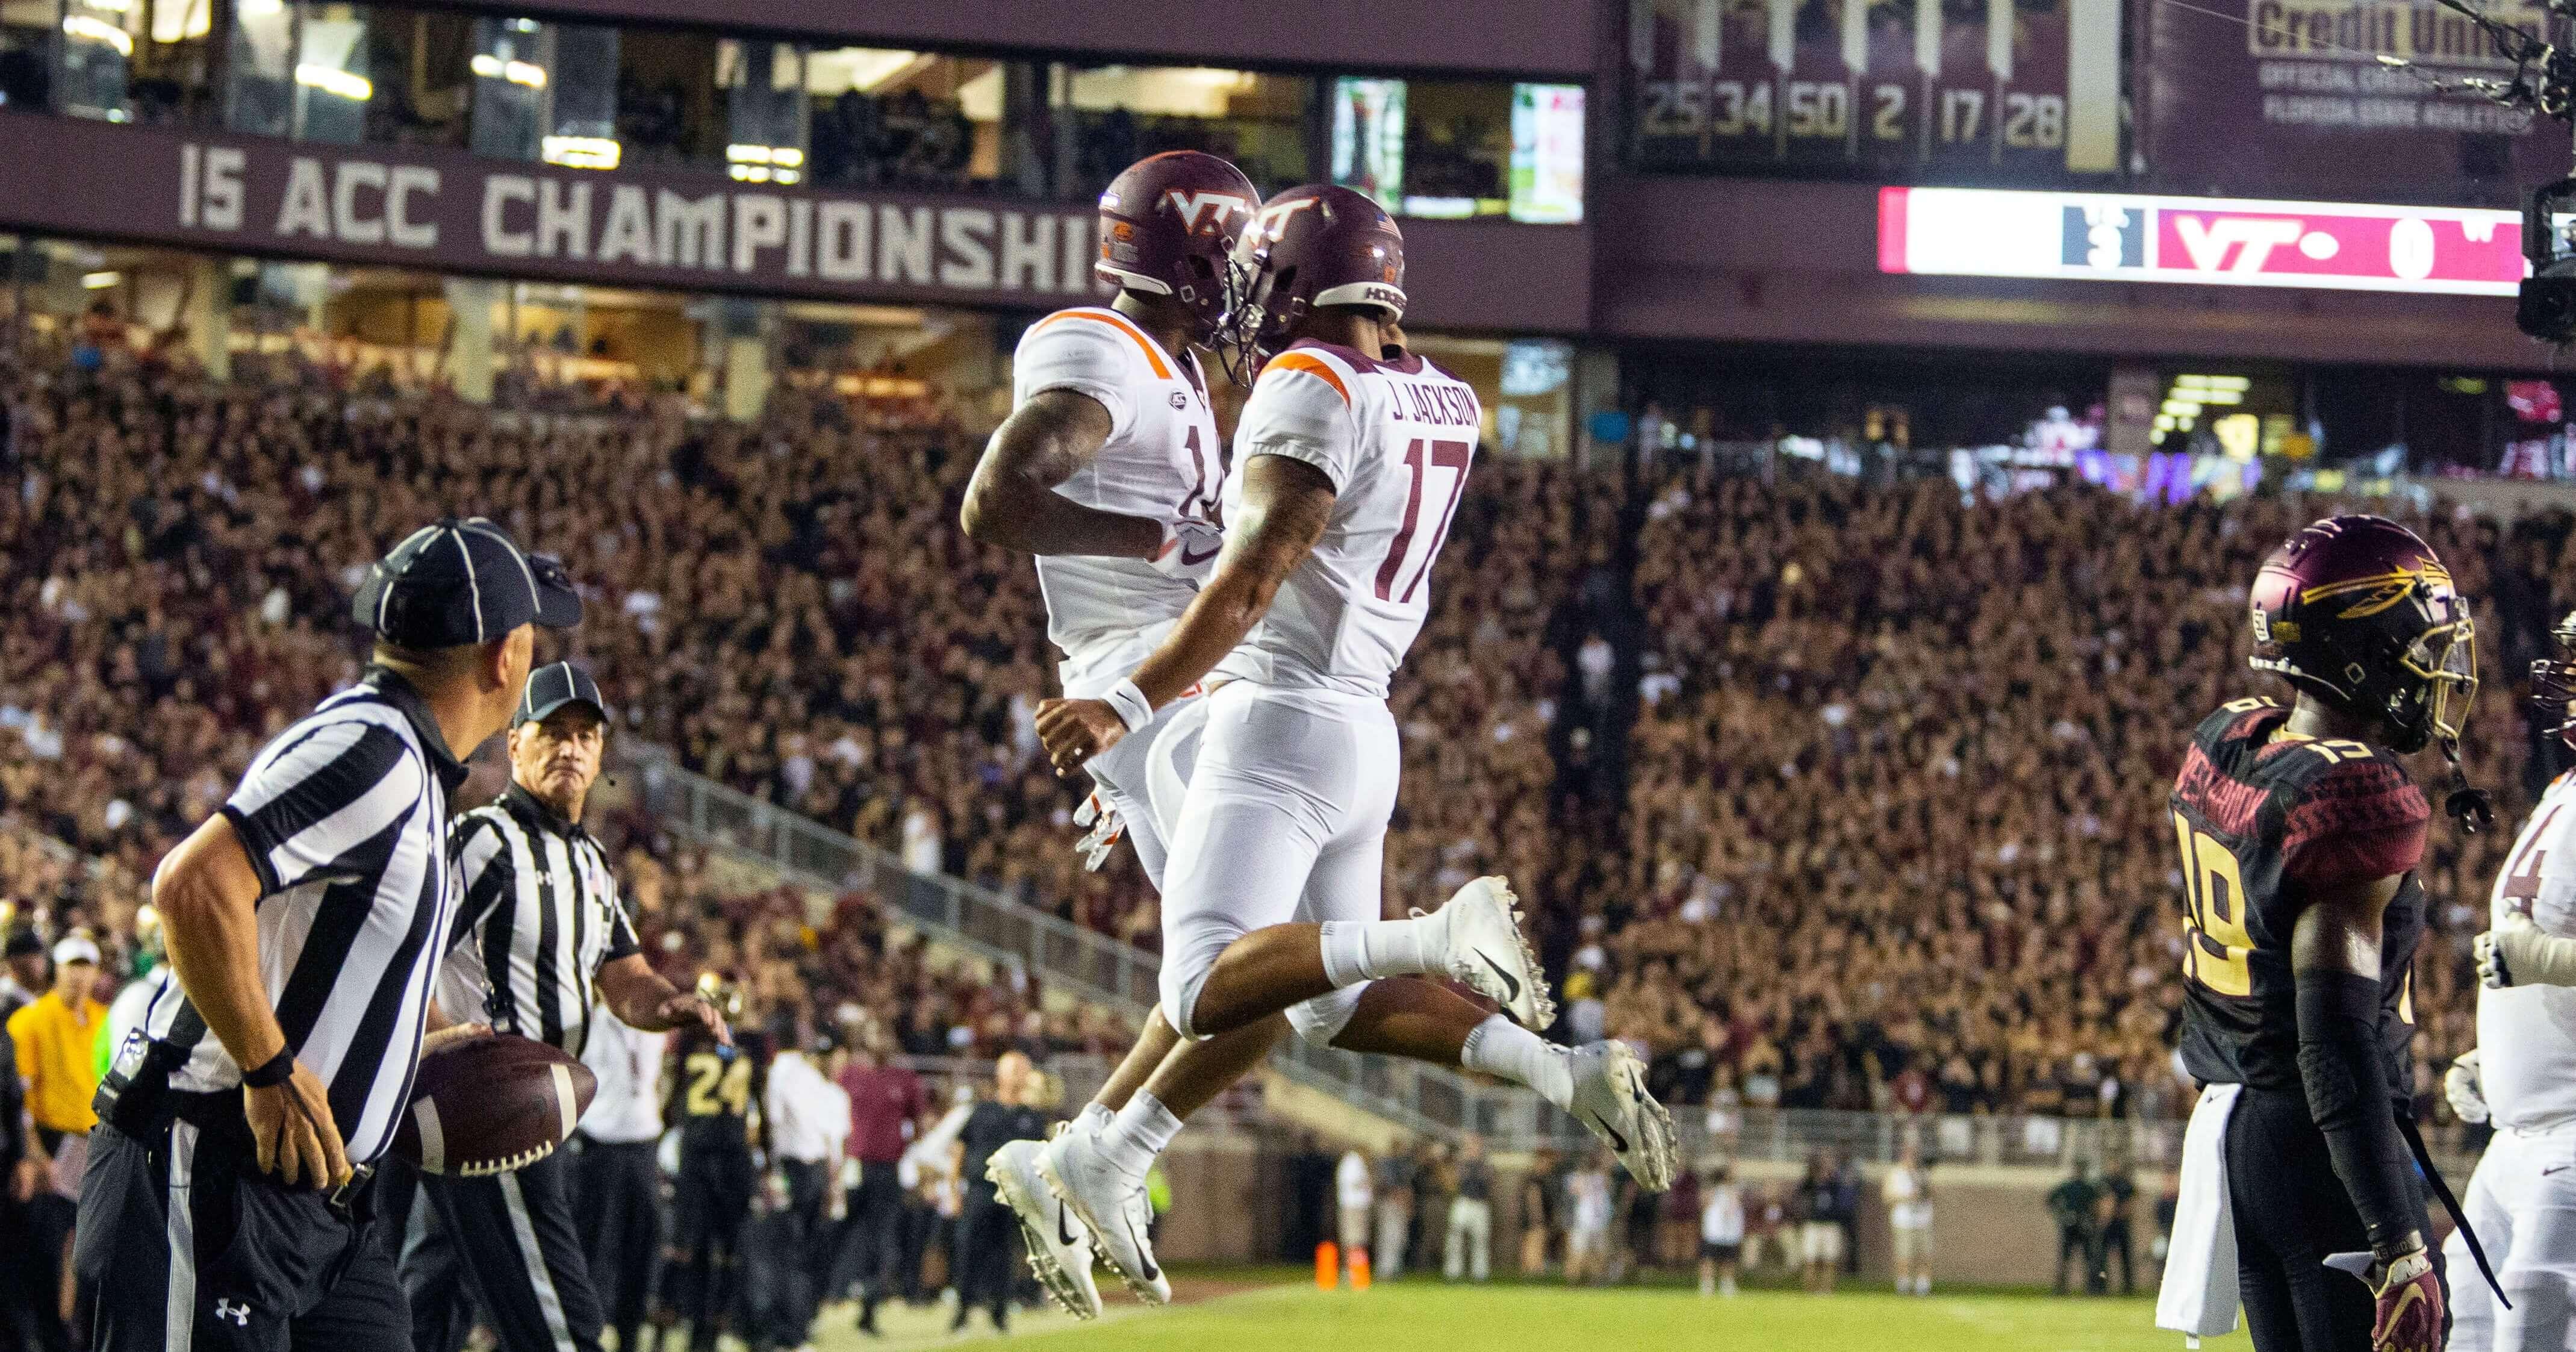 Virginia Tech Hokies wide receiver Damon Hazelton, left, and quarterback quarterback Josh Jackson celebrate a touchdown on their first drive against Florida State on Monday night in Tallahassee.